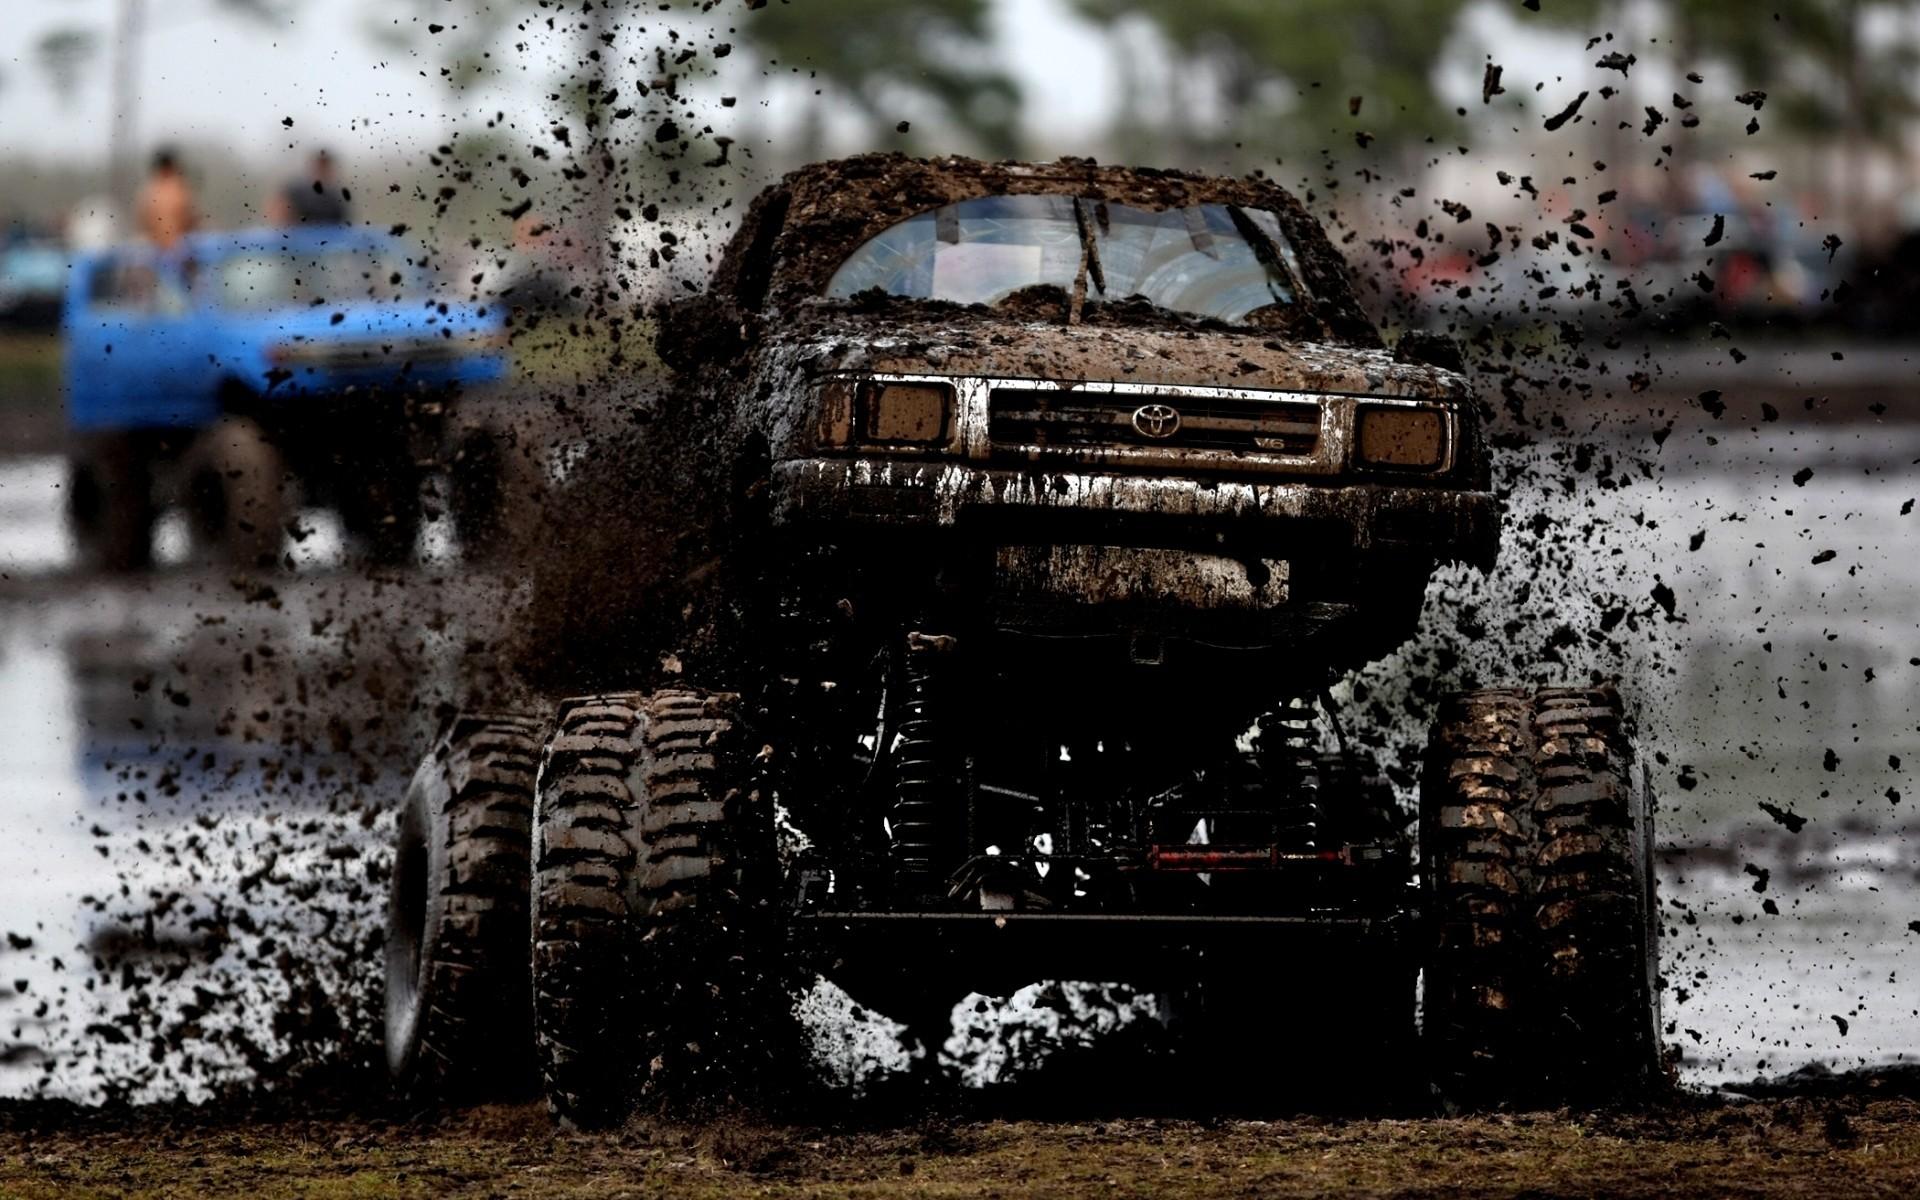 car snow vehicle mud Toyota trucks offroad Jeep material screenshot automobile make auto racing off roading off road vehicle monster truck 158651